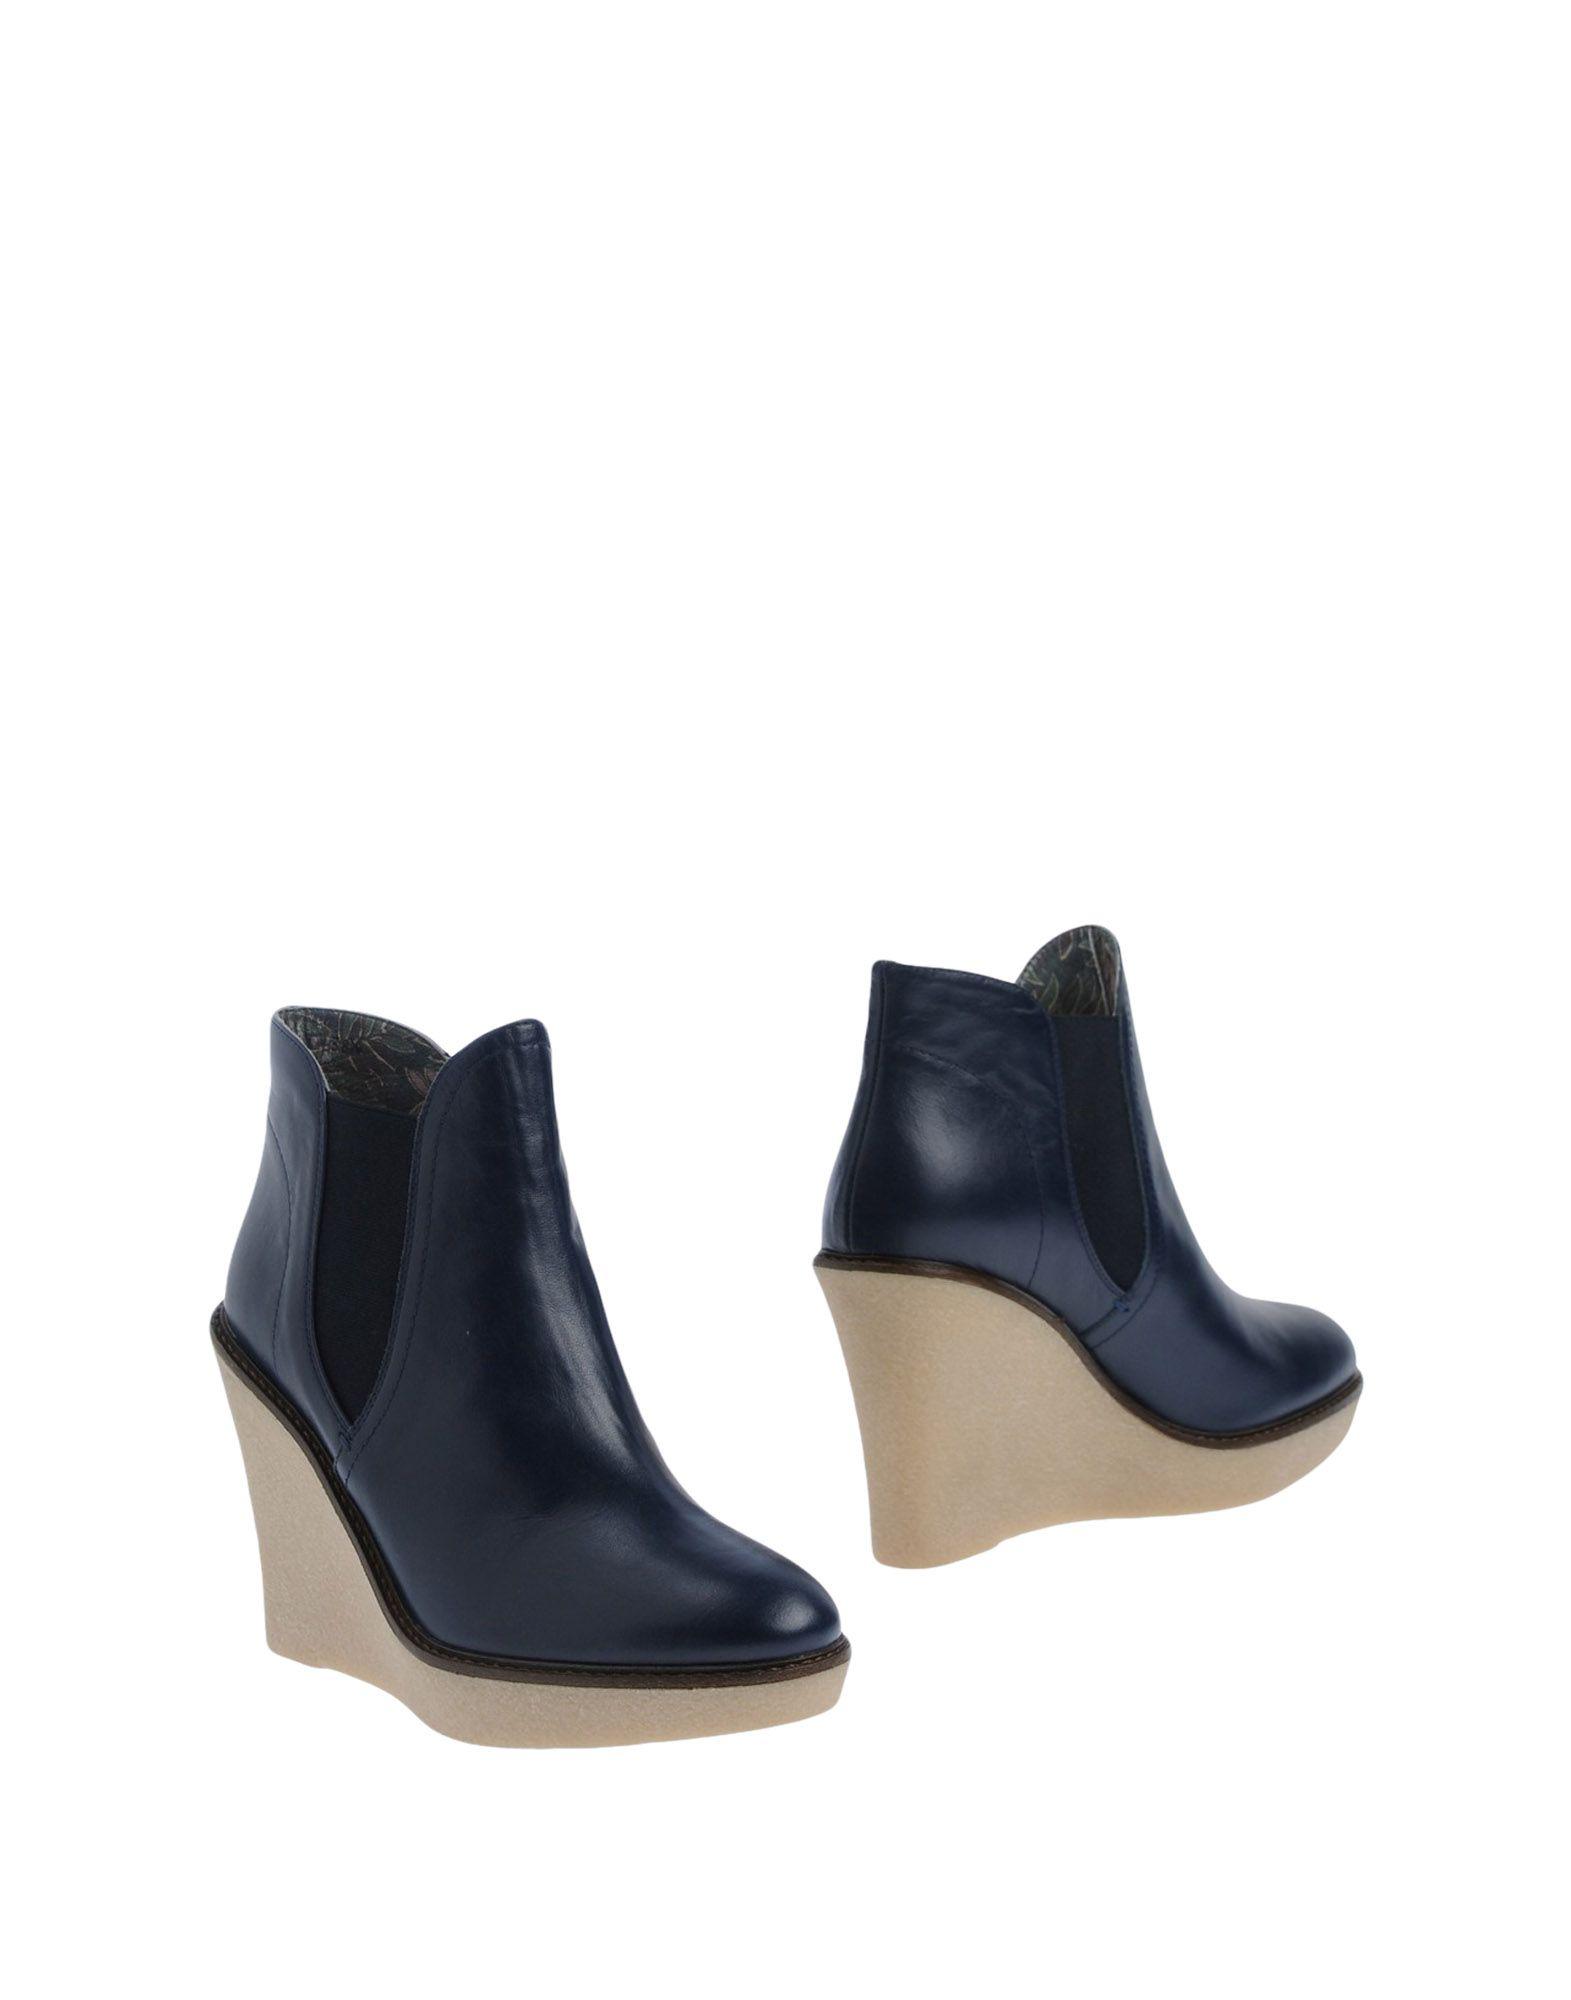 GIANNA MELIANI Ankle Boot in Dark Blue